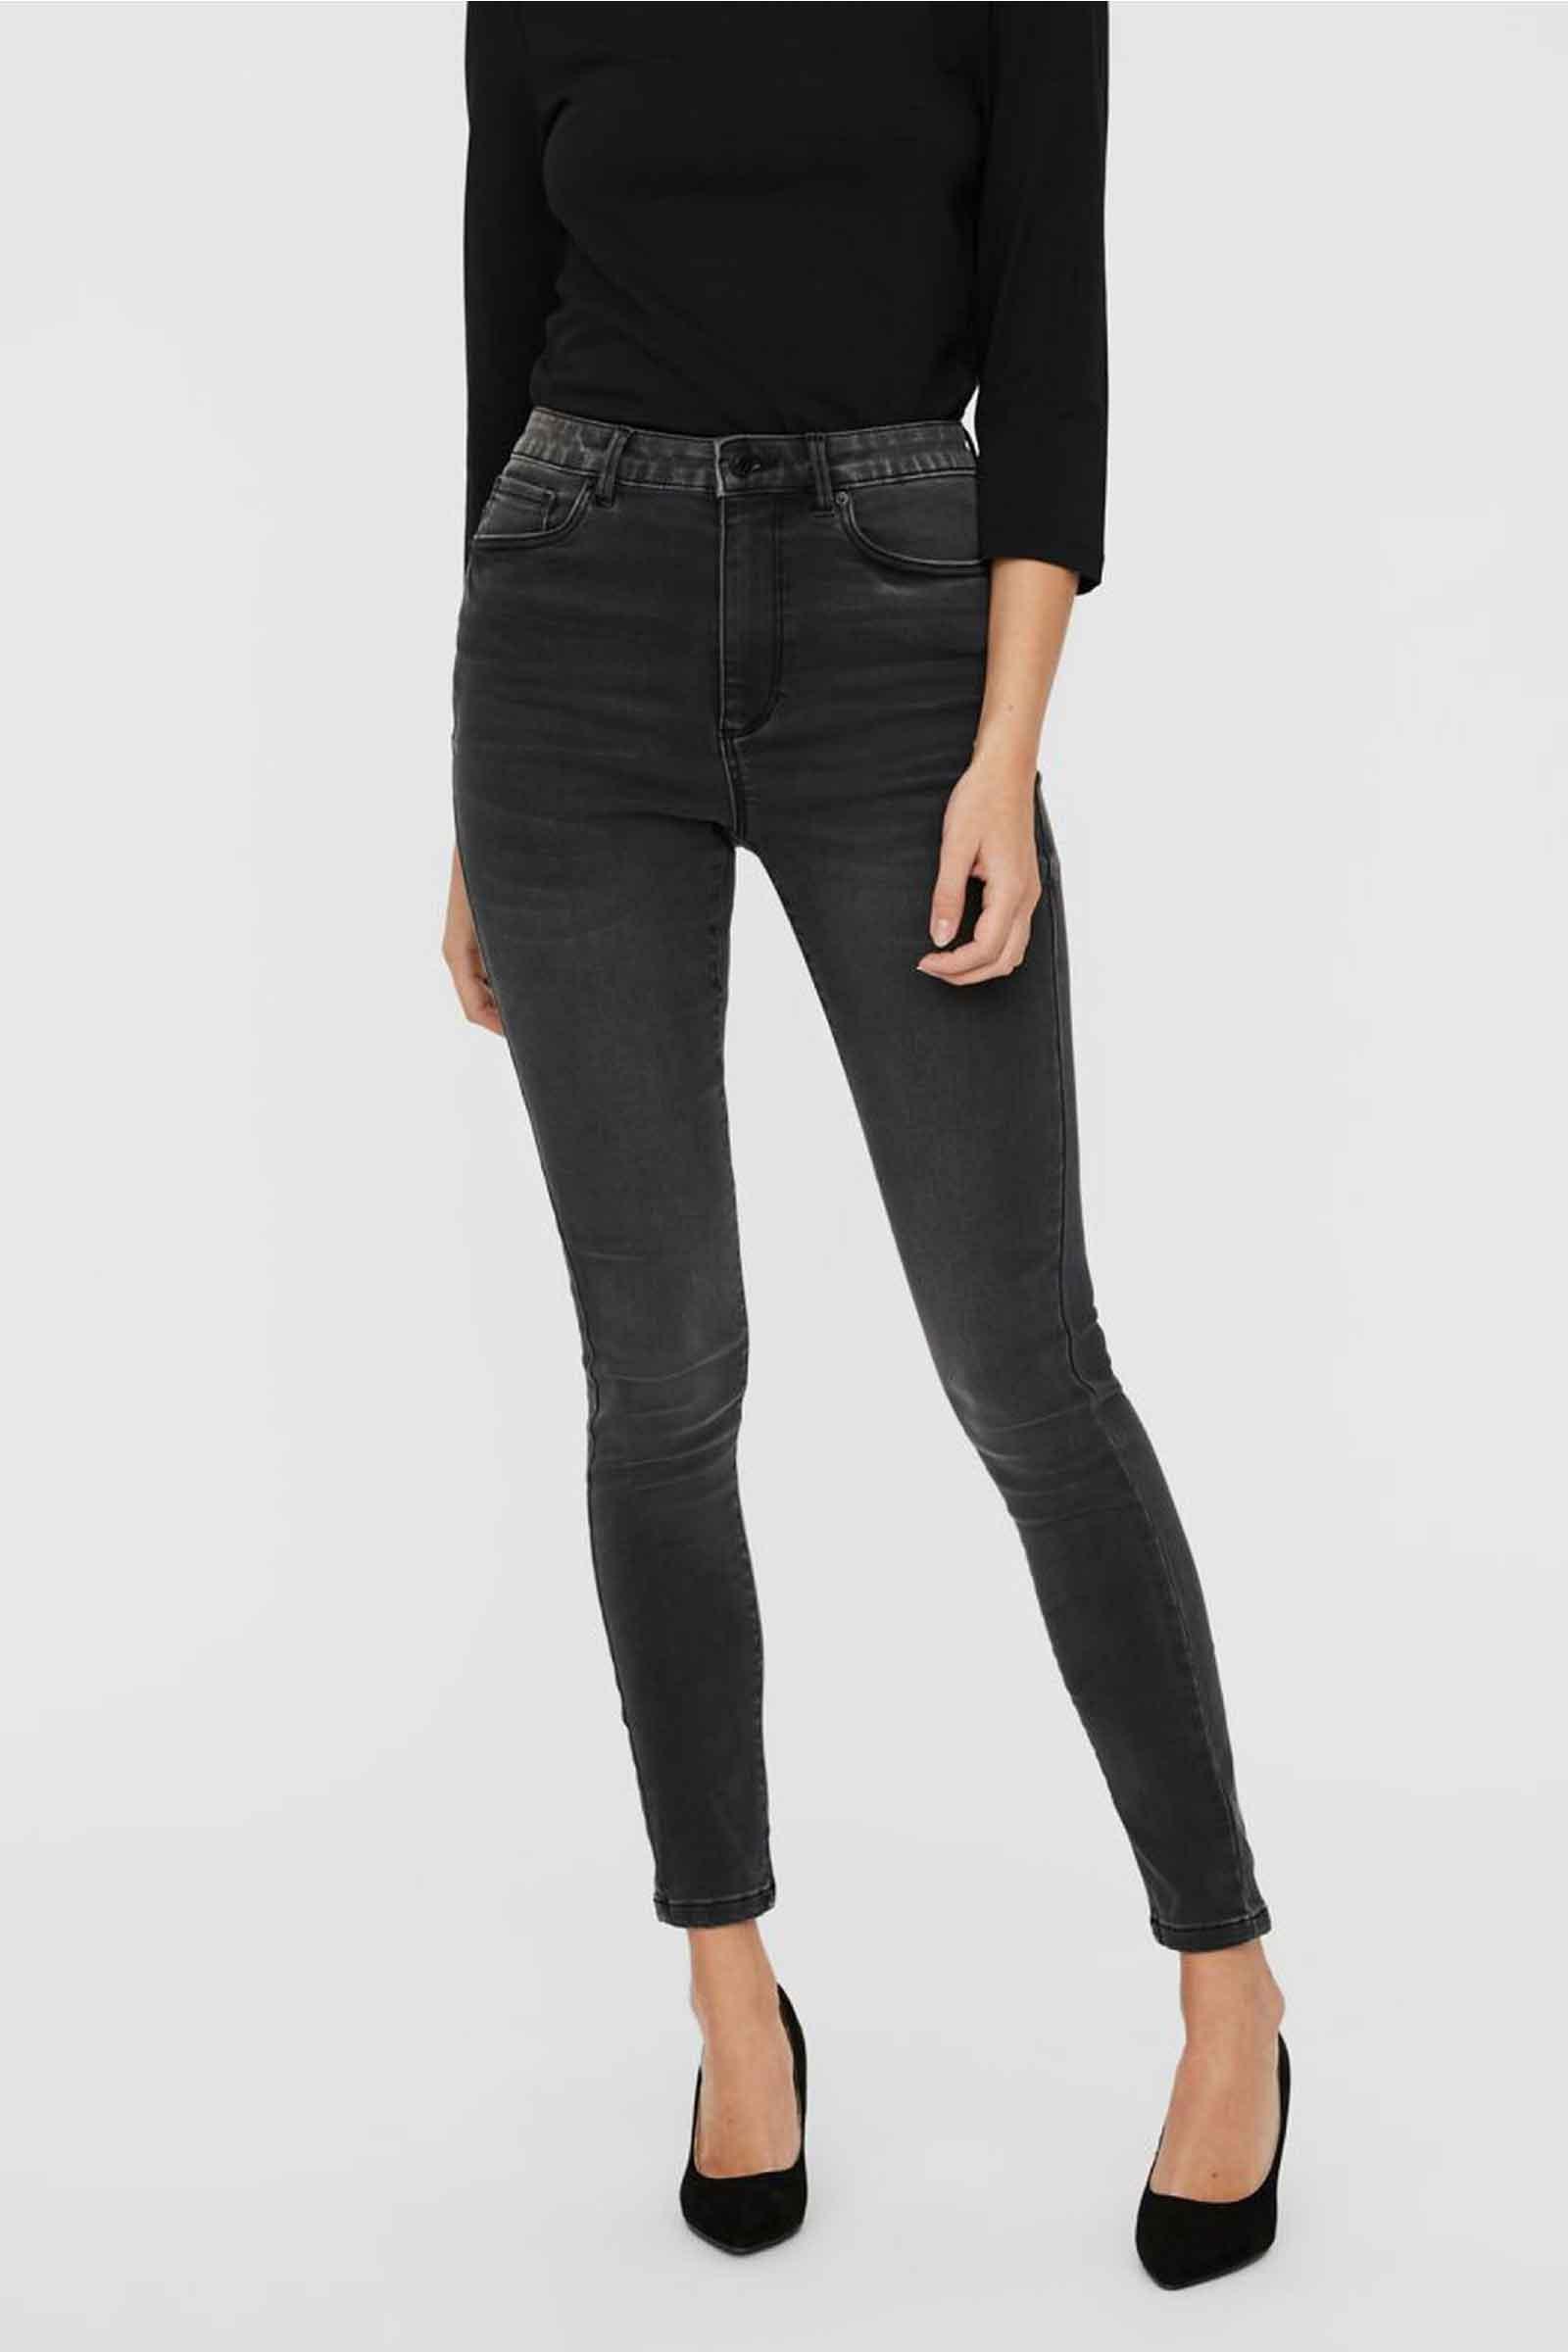 Women's Jeans VERO MODA | Jeans | 10249716Dark Grey Denim